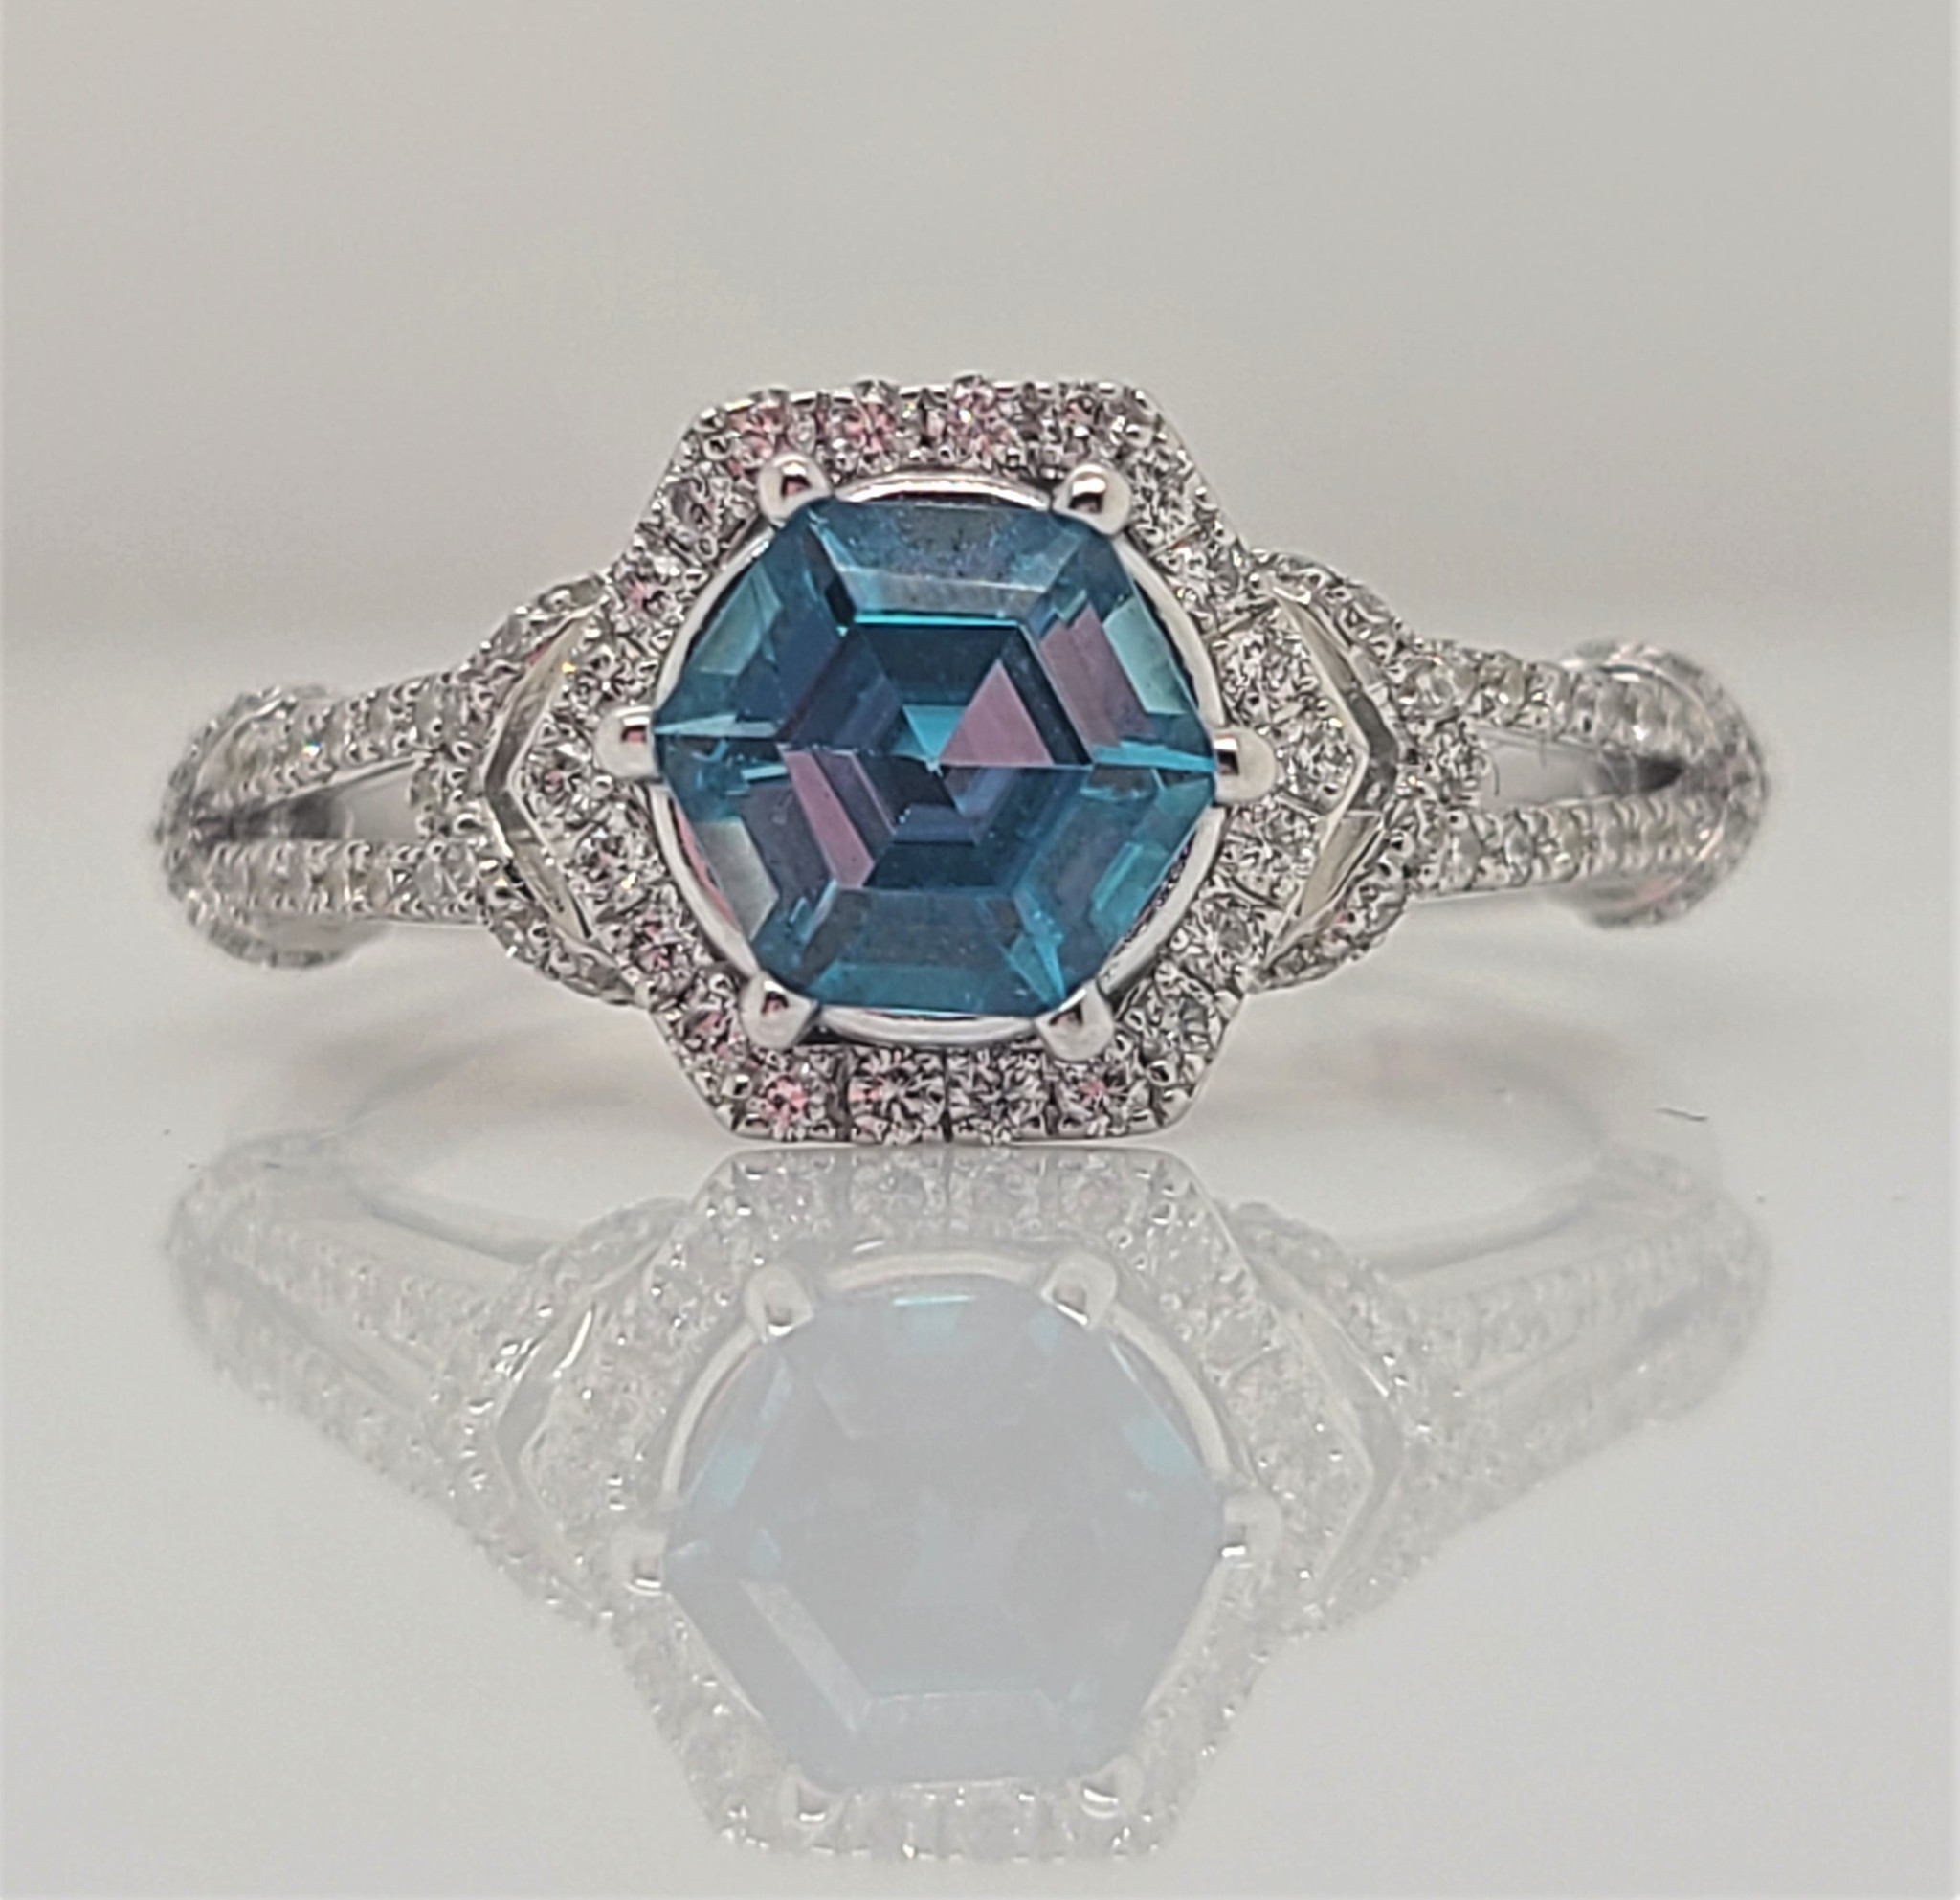 Appelblom Jewelry Co blue zircon ring